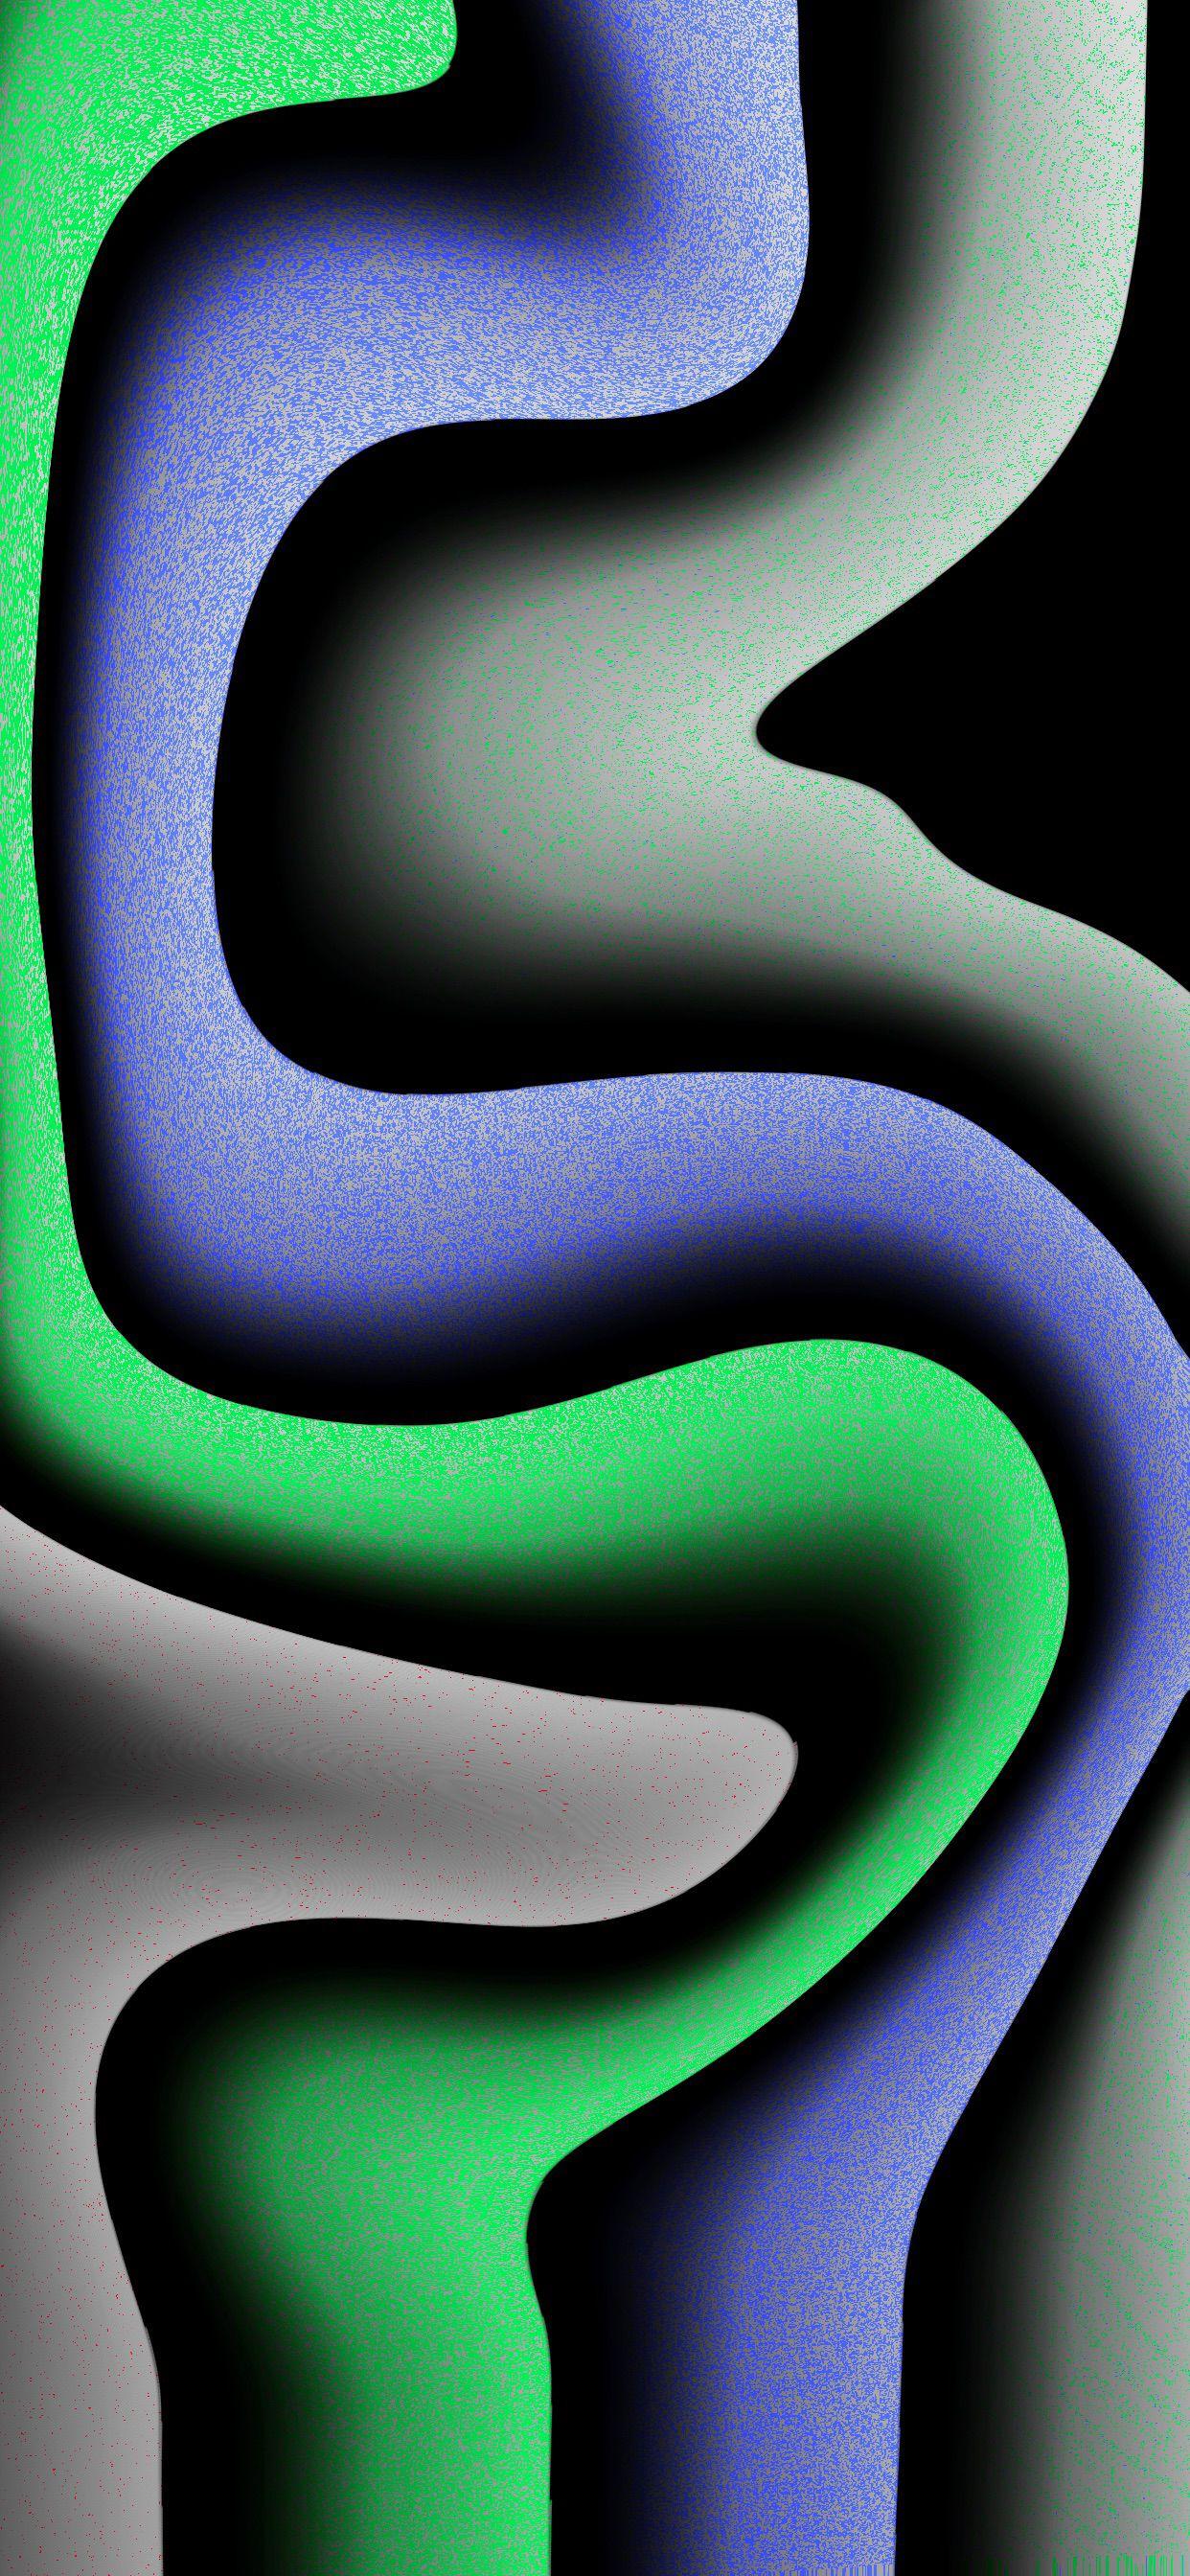 Pin by Satishjain JainS.C on Art abstract Graphic